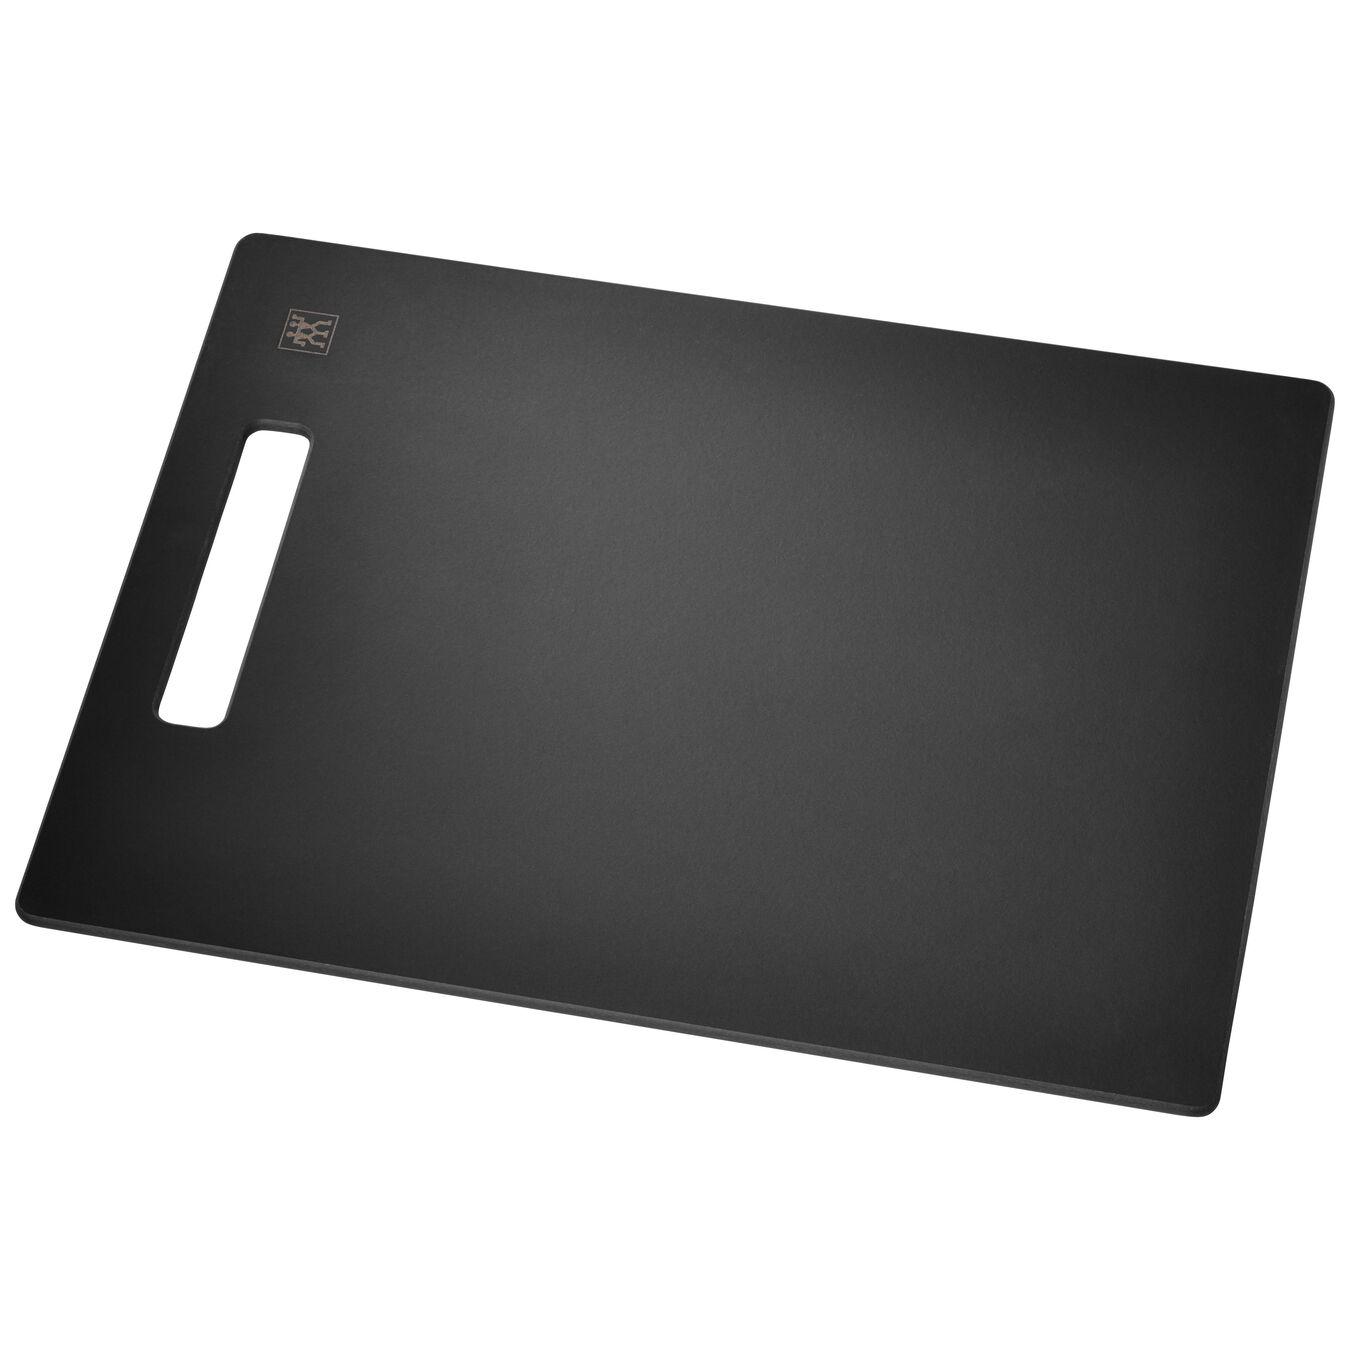 Cutting board 38 cm x 28 cm Fibre wood,,large 1